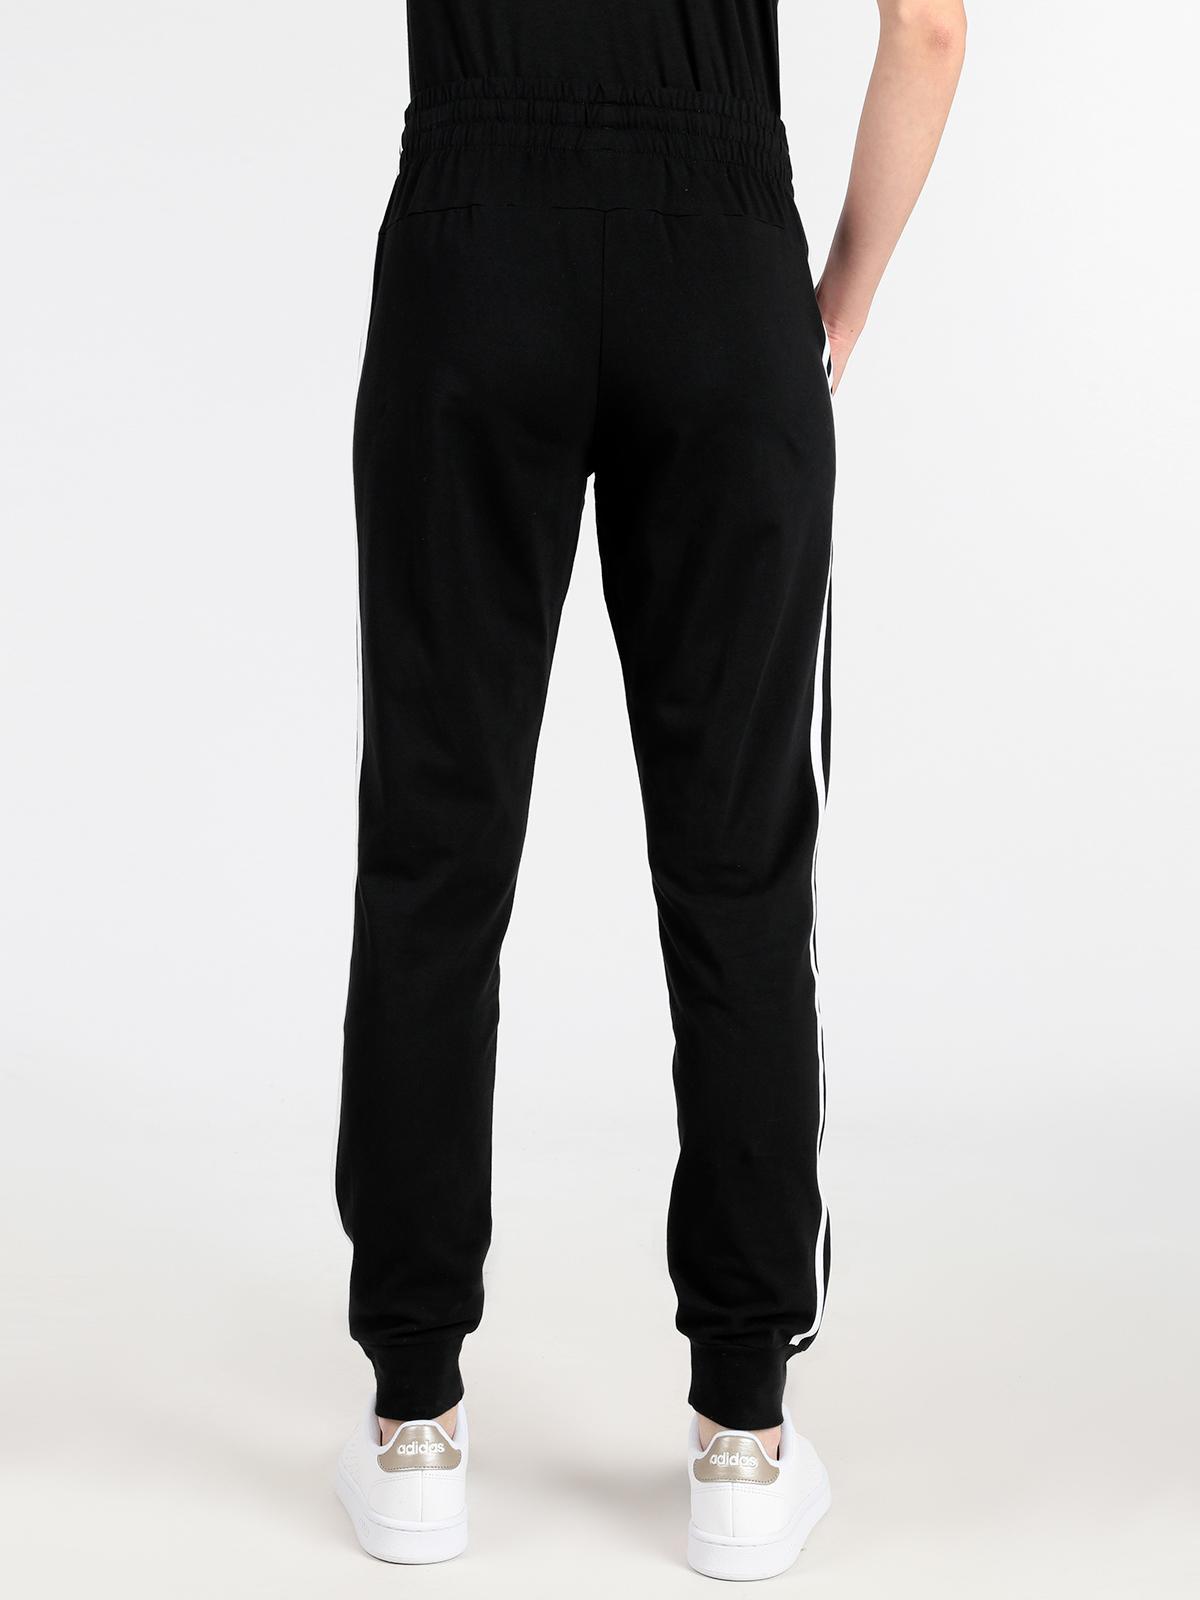 pantaloni adidas aperti lato donna